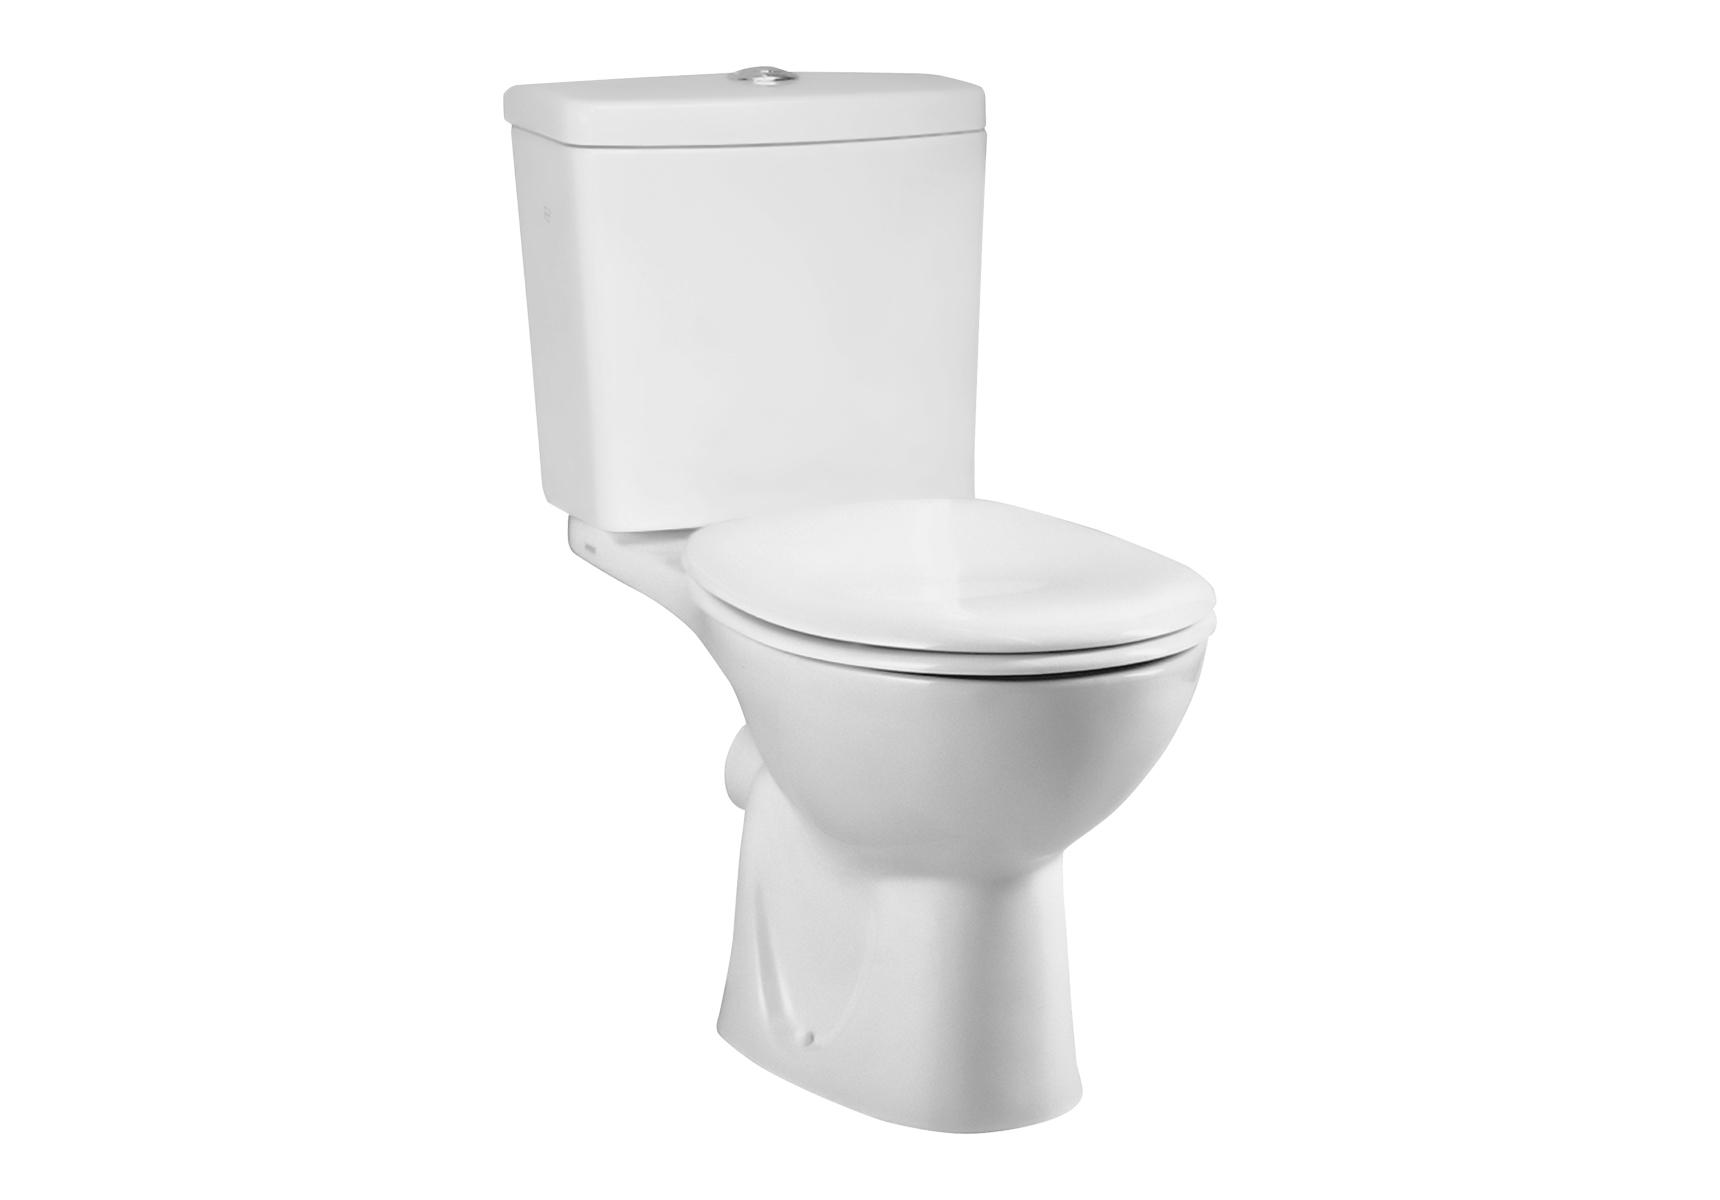 Arkitekt WC à poser avec bride, 65 cm, S / H